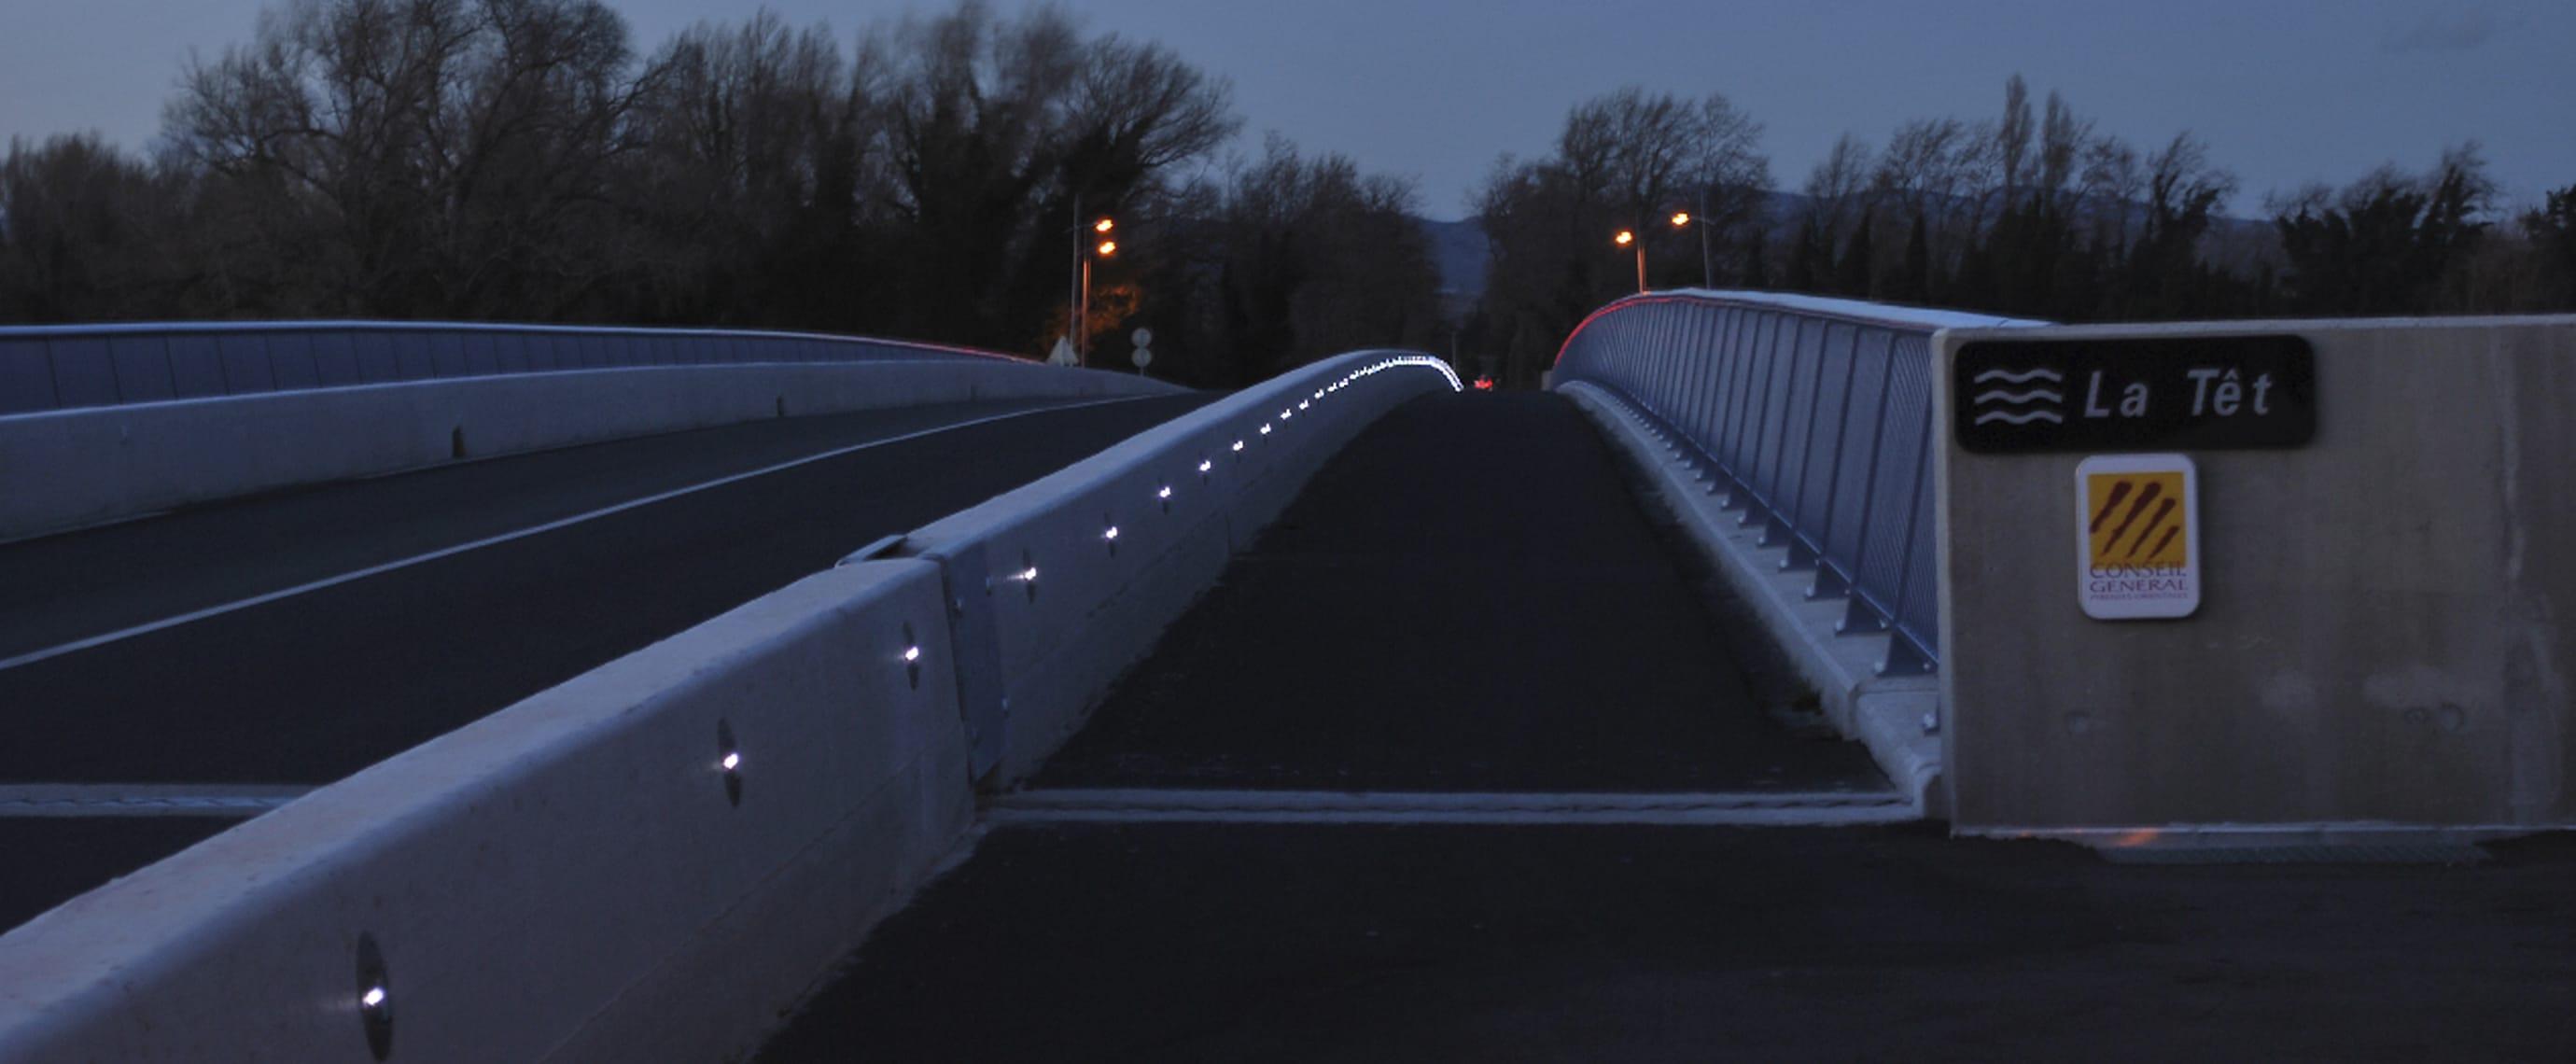 Piste cyclable balisage LED solaire avec plot solaire ECO-143 Eco-Innov